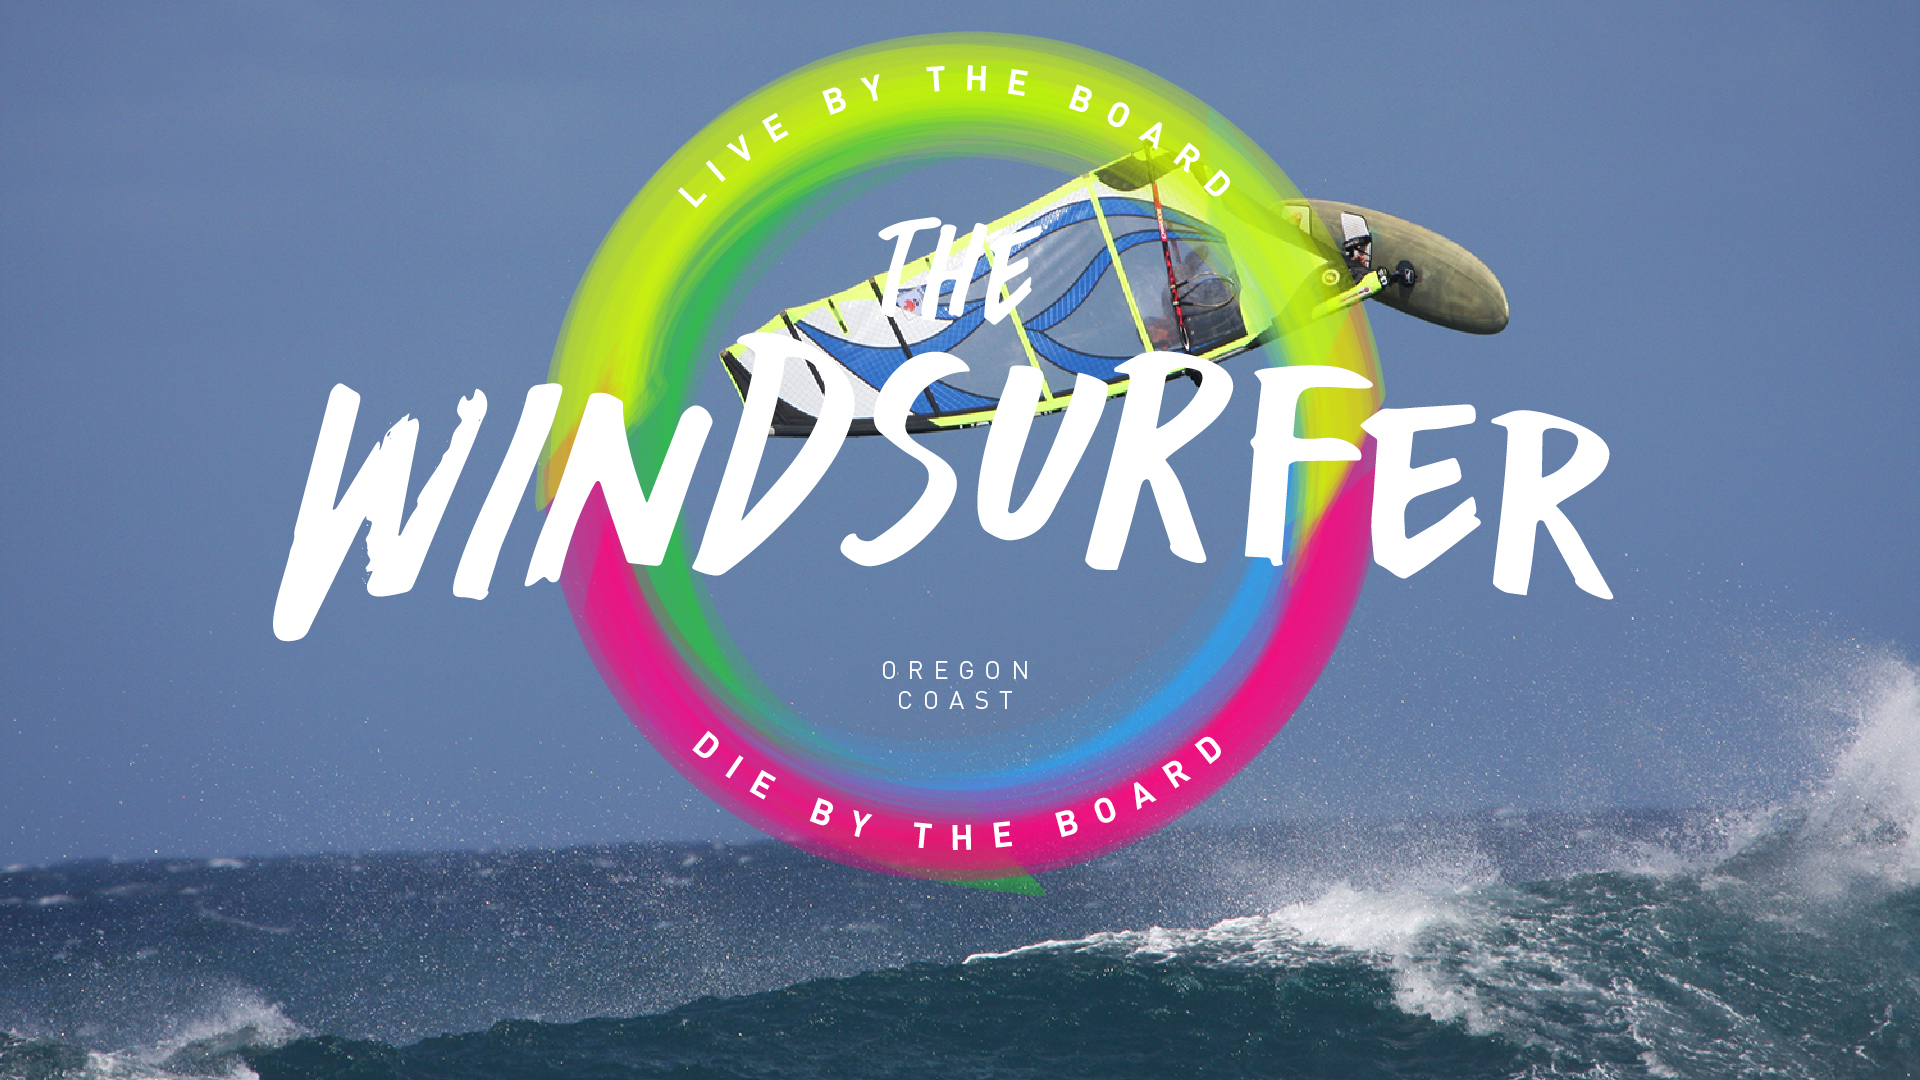 koav-windsurfer-sessions-oregon-title